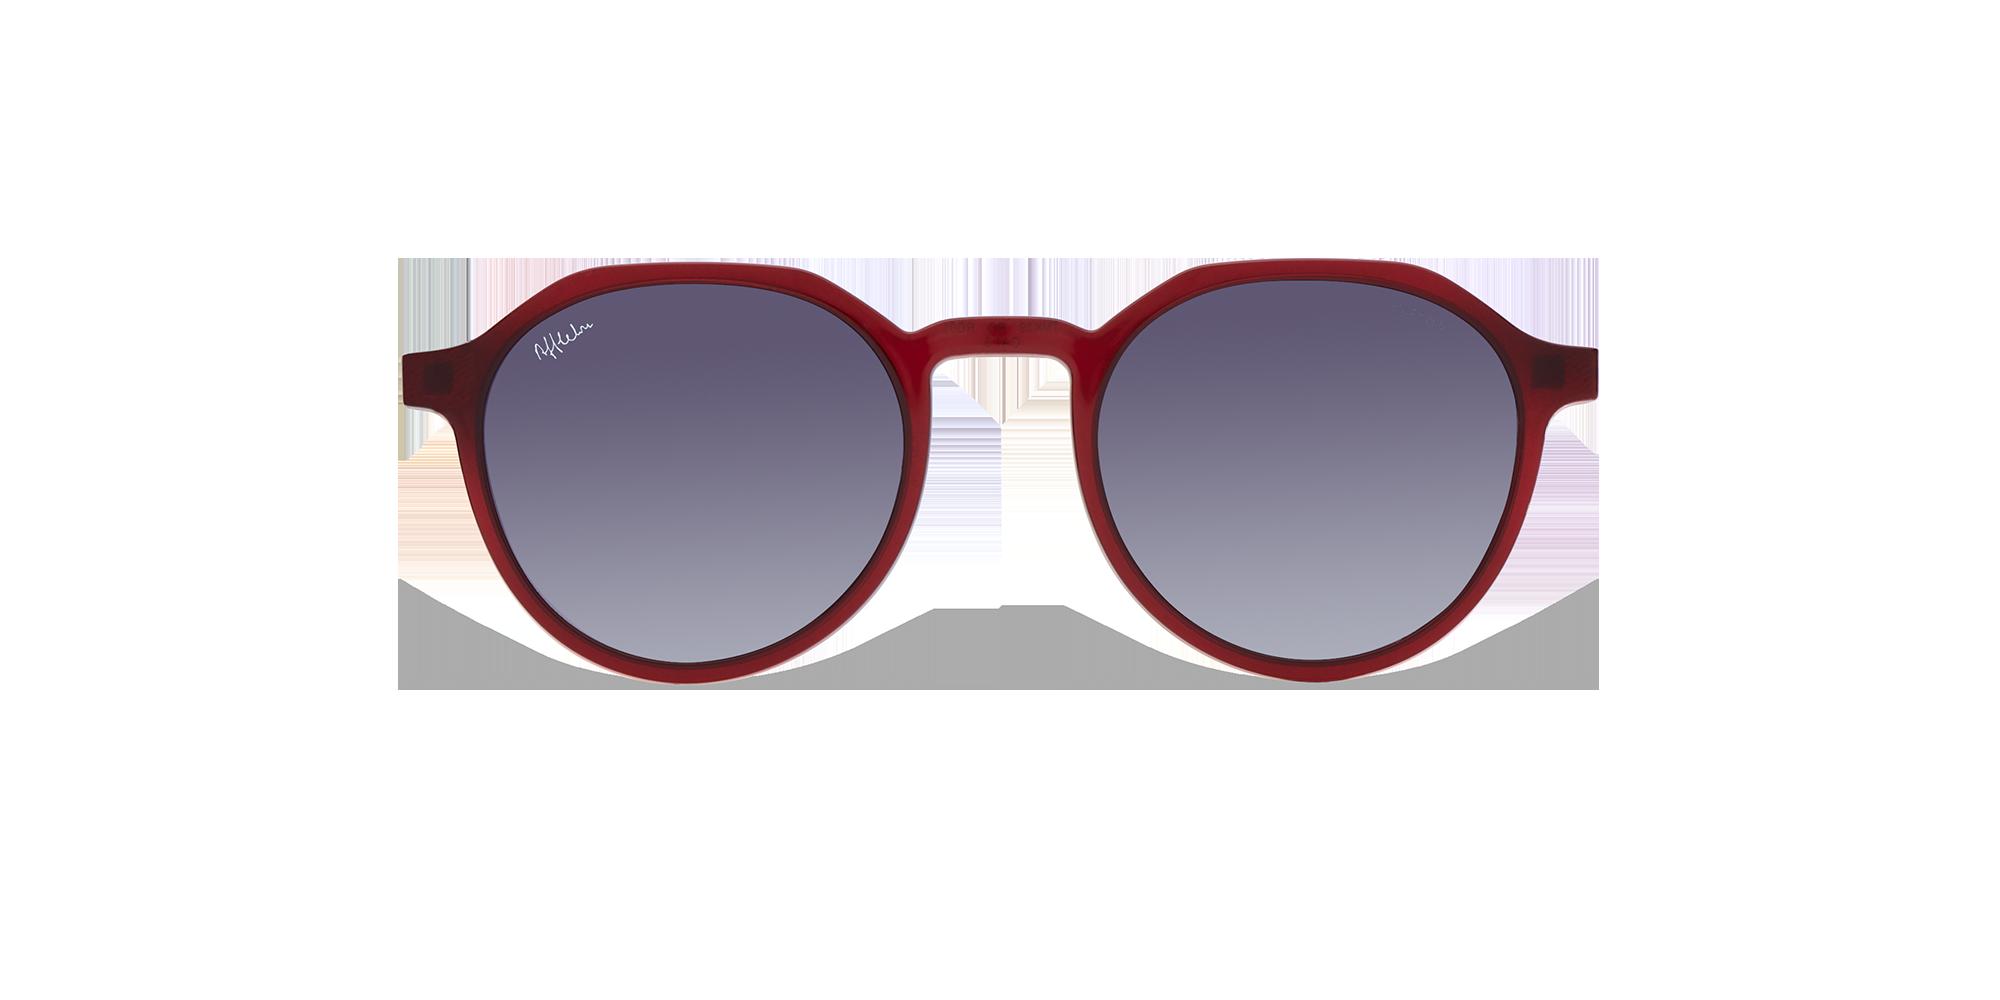 afflelou/france/products/smart_clip/clips_glasses/07630036428962_face.png